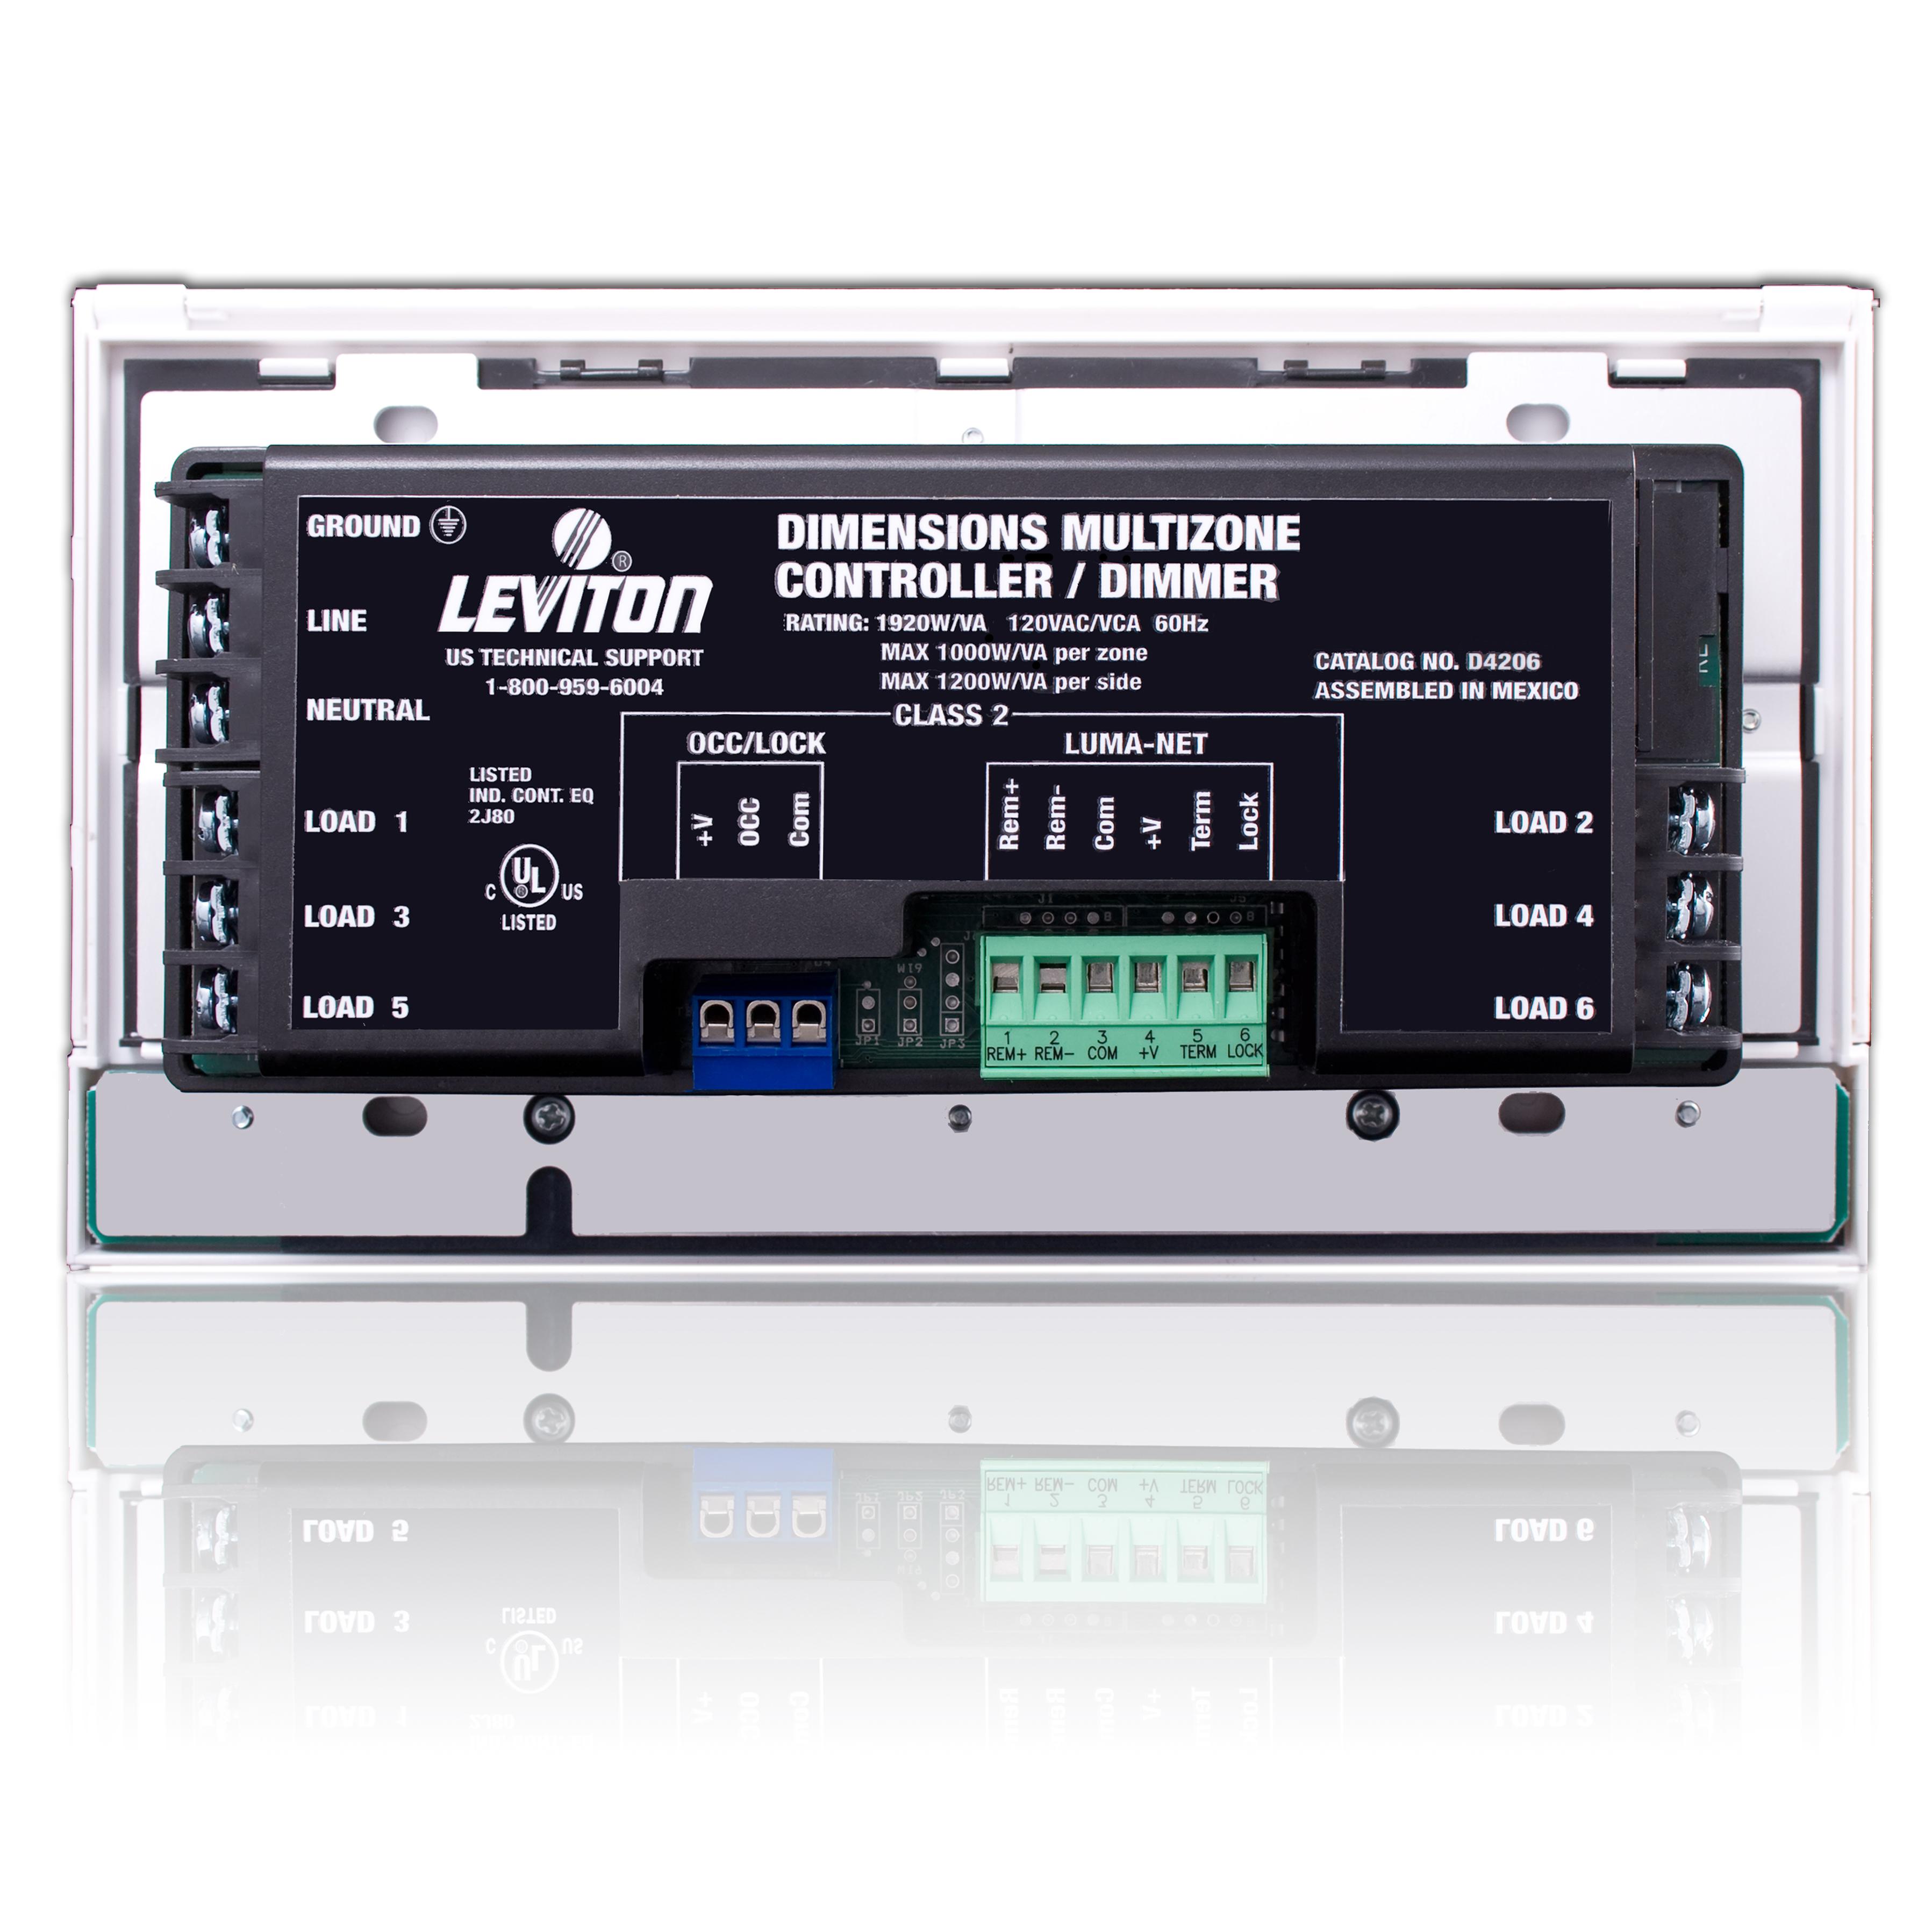 Leviton® D4206-1LW D4206-6 120V DIM32CH | Steiner Electric Company